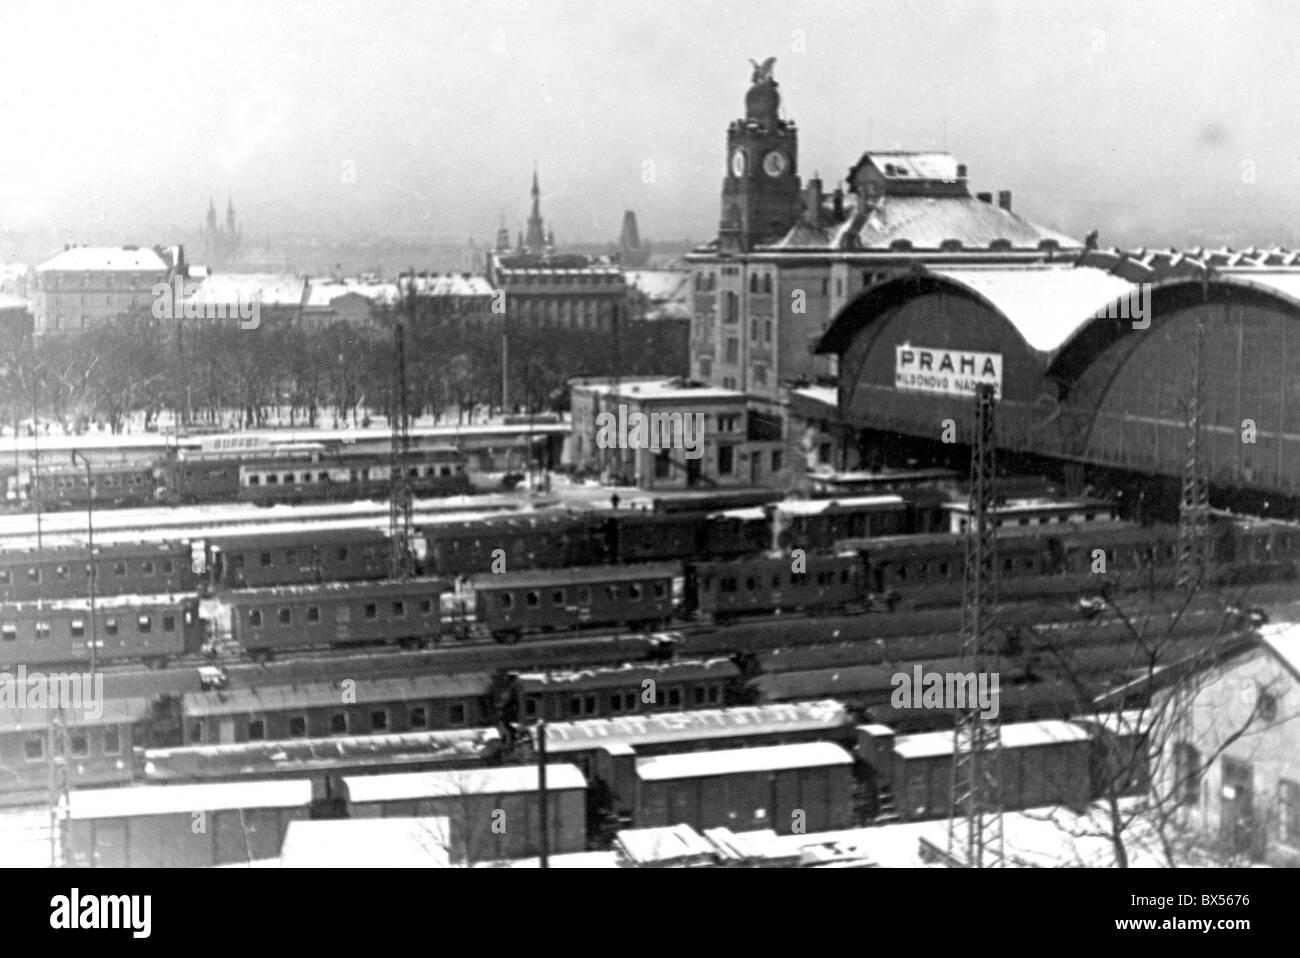 Czechoslovakia 1934, snow covered train tracks and train wagons seen at Wilson Train Sation. - Stock Image